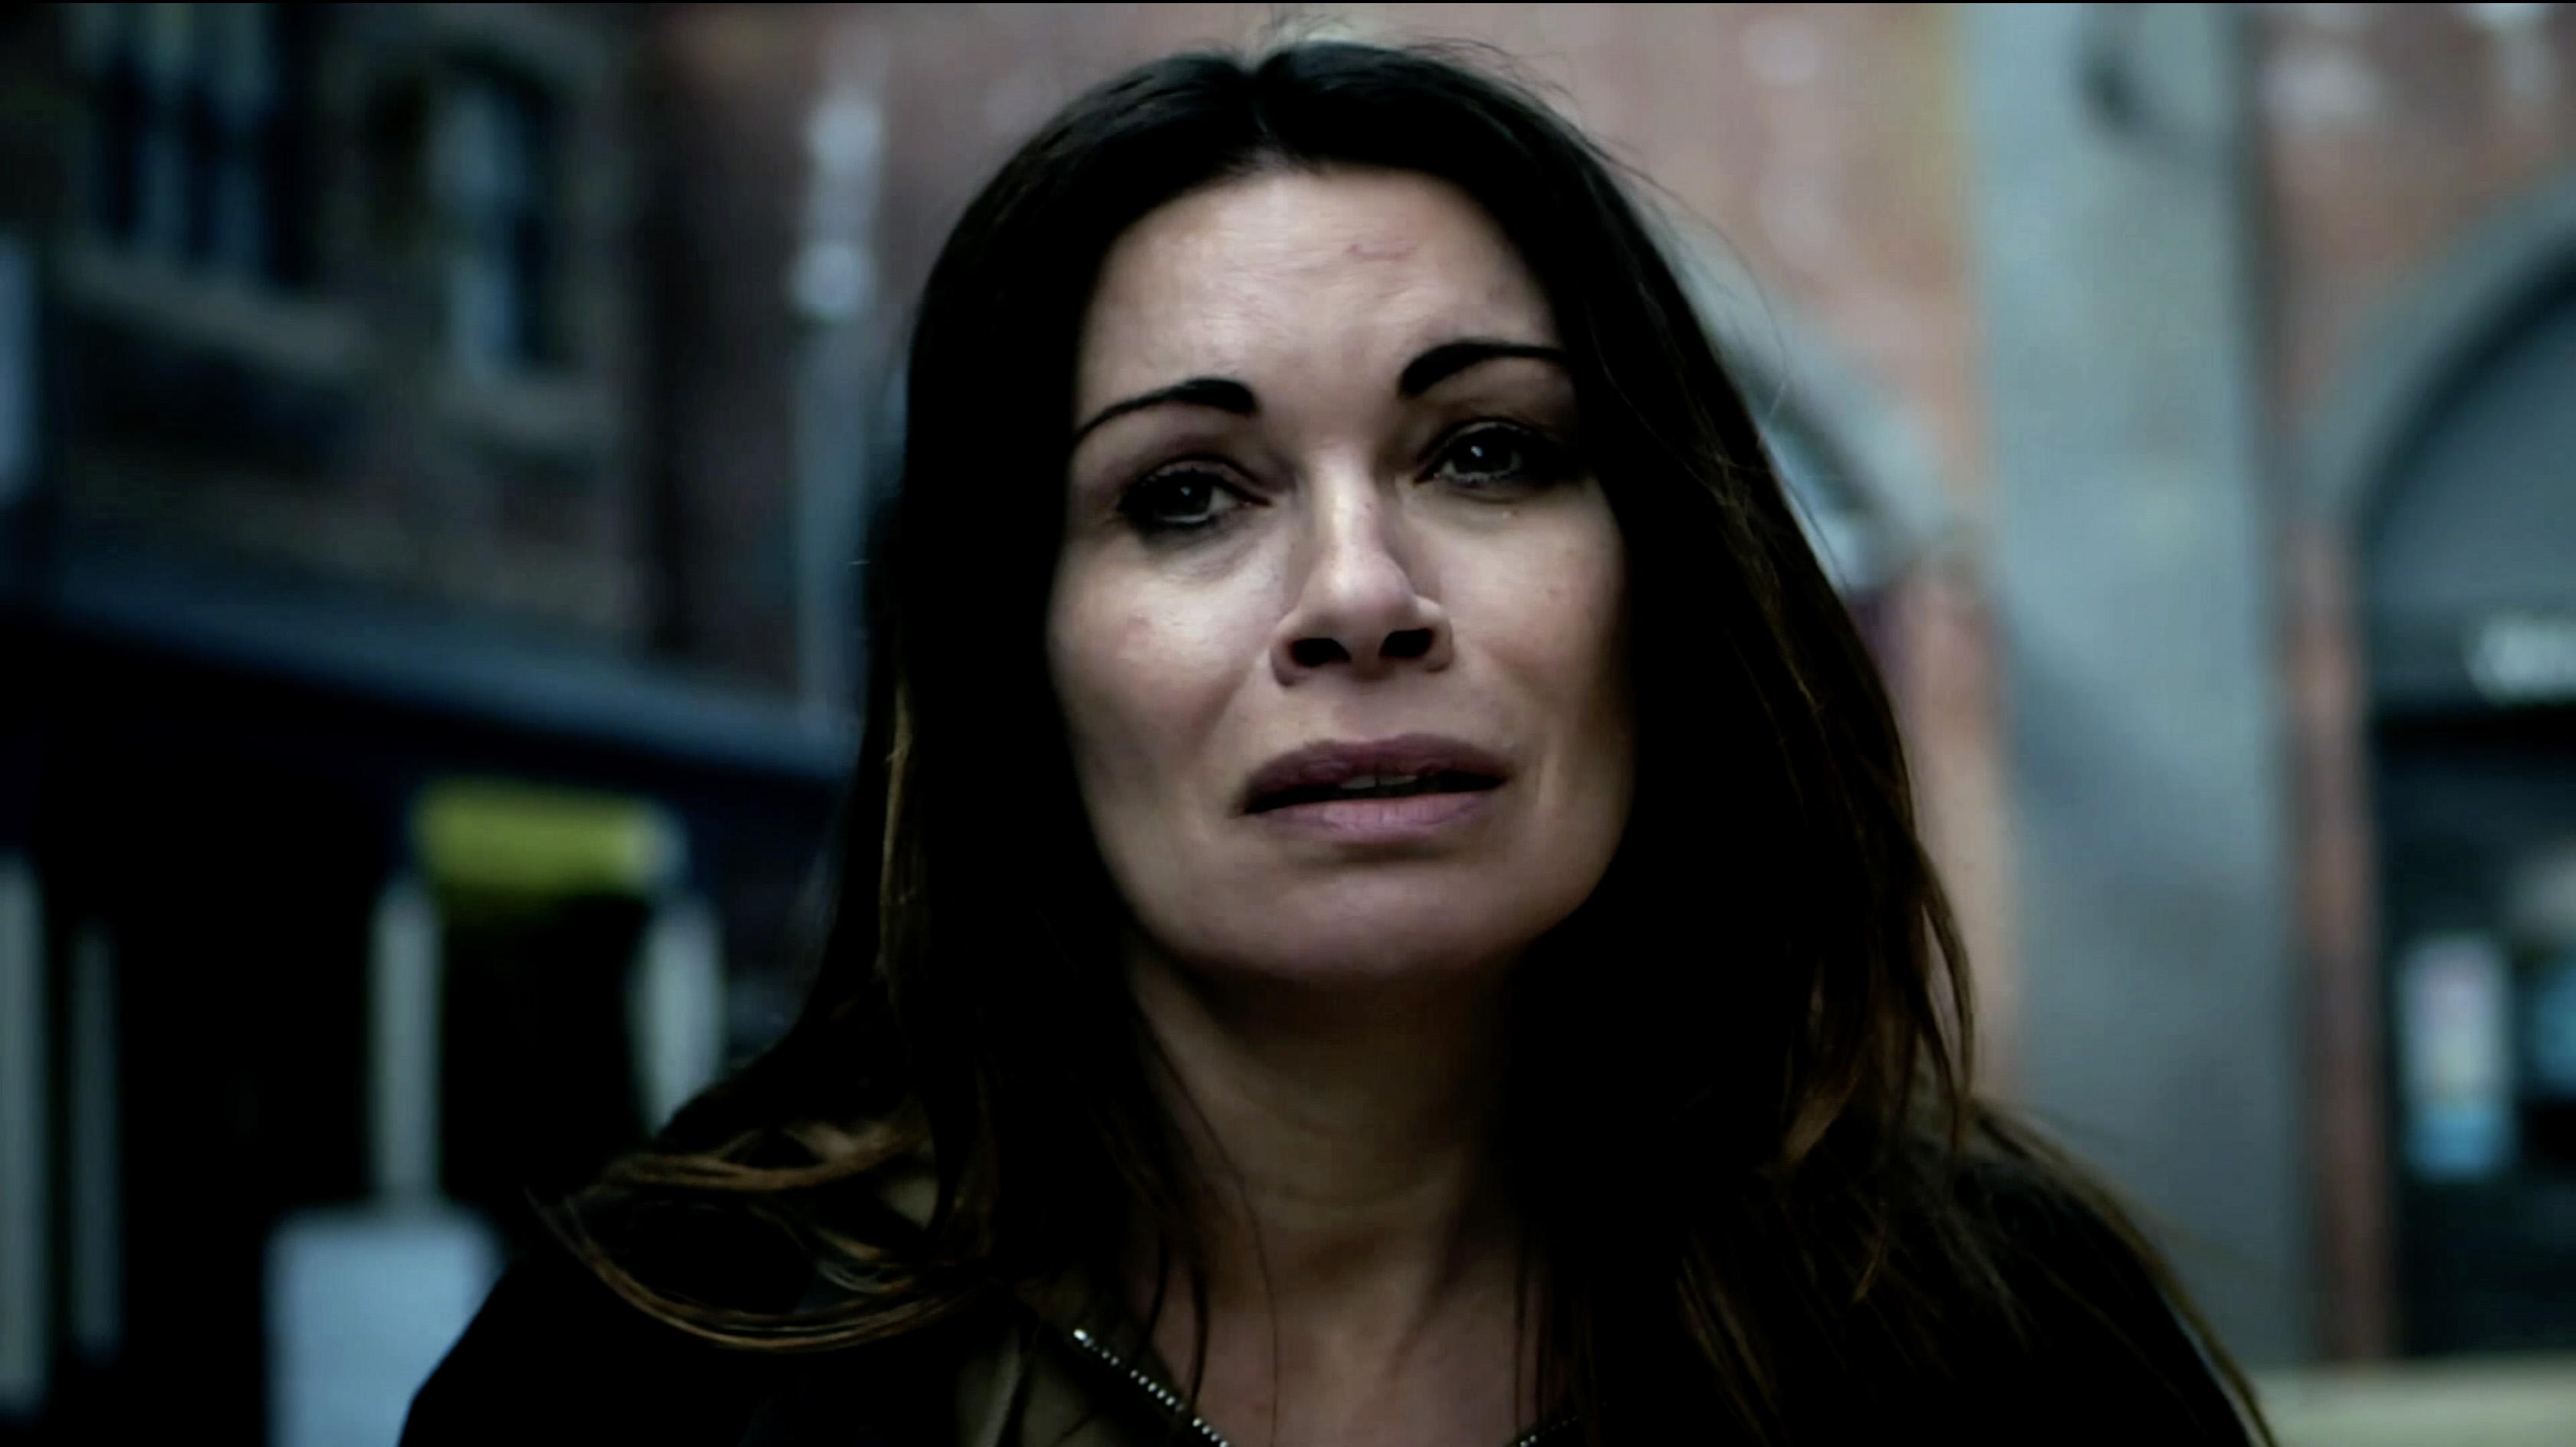 10 soap spoiler moments: Coronation Street killer unmasked, EastEnders missing teen, Emmerdale baby news